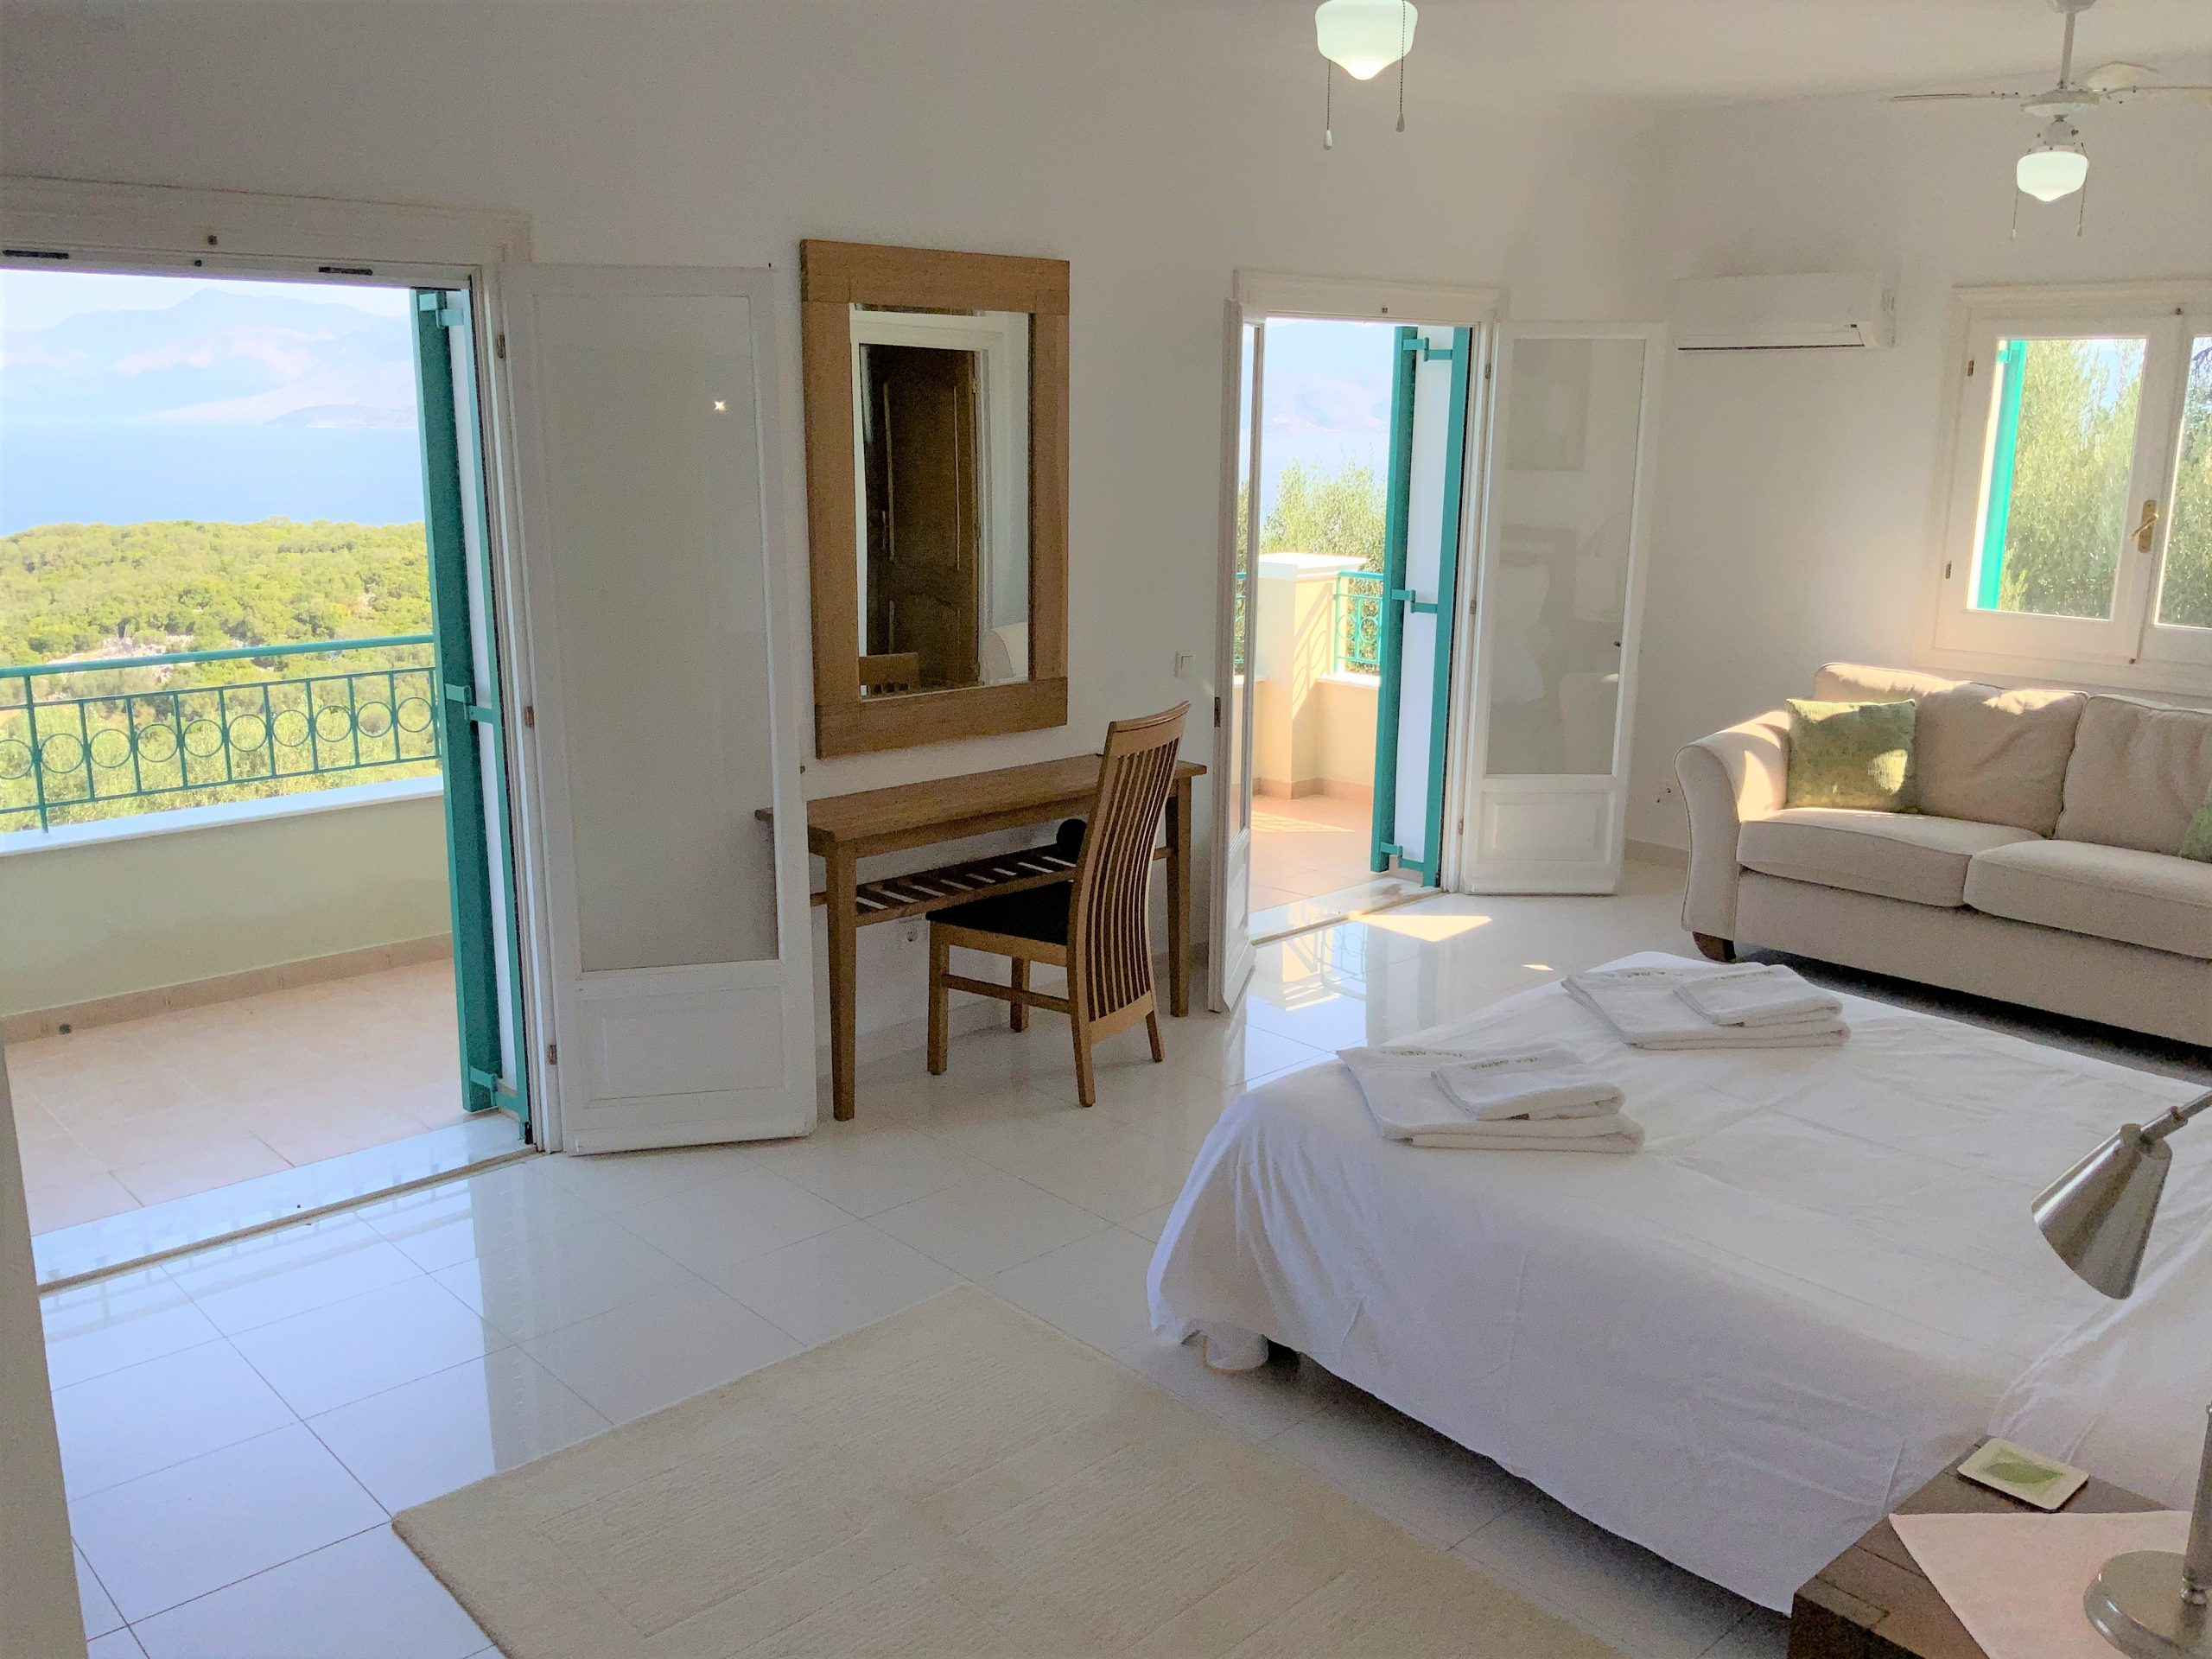 Bedroom with views across Corfu